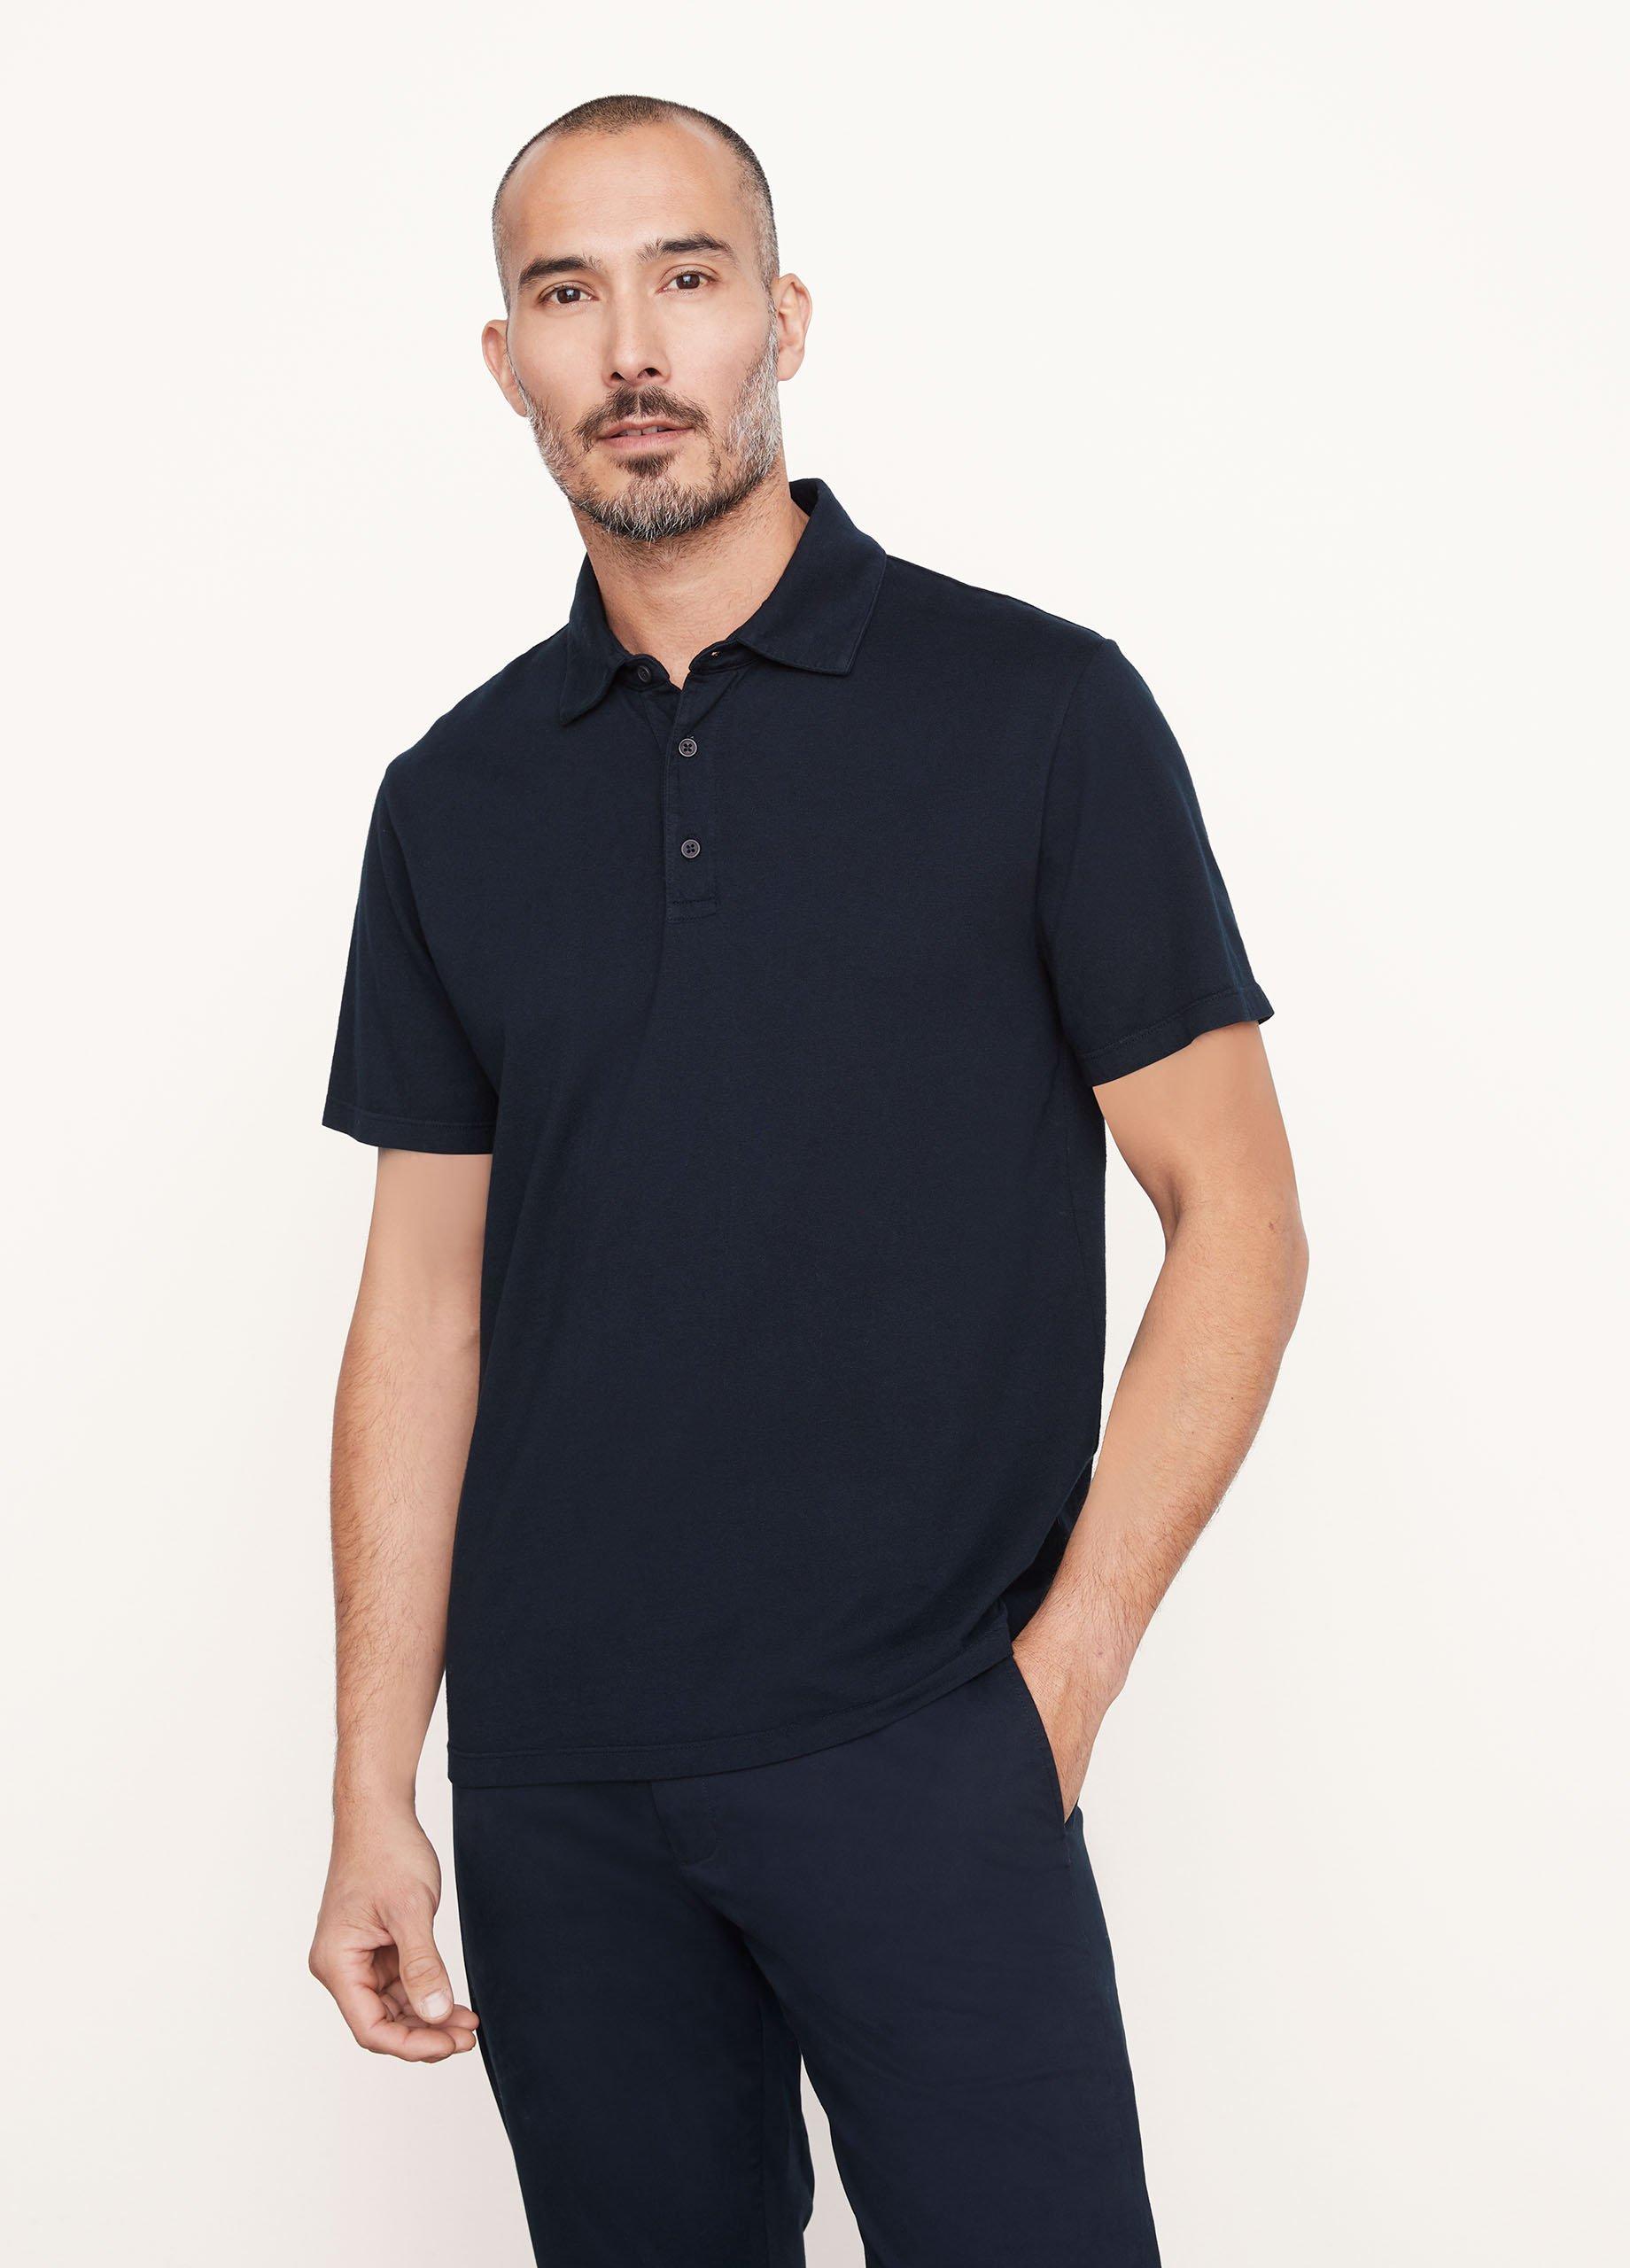 Garment Dye Short Sleeve Polo